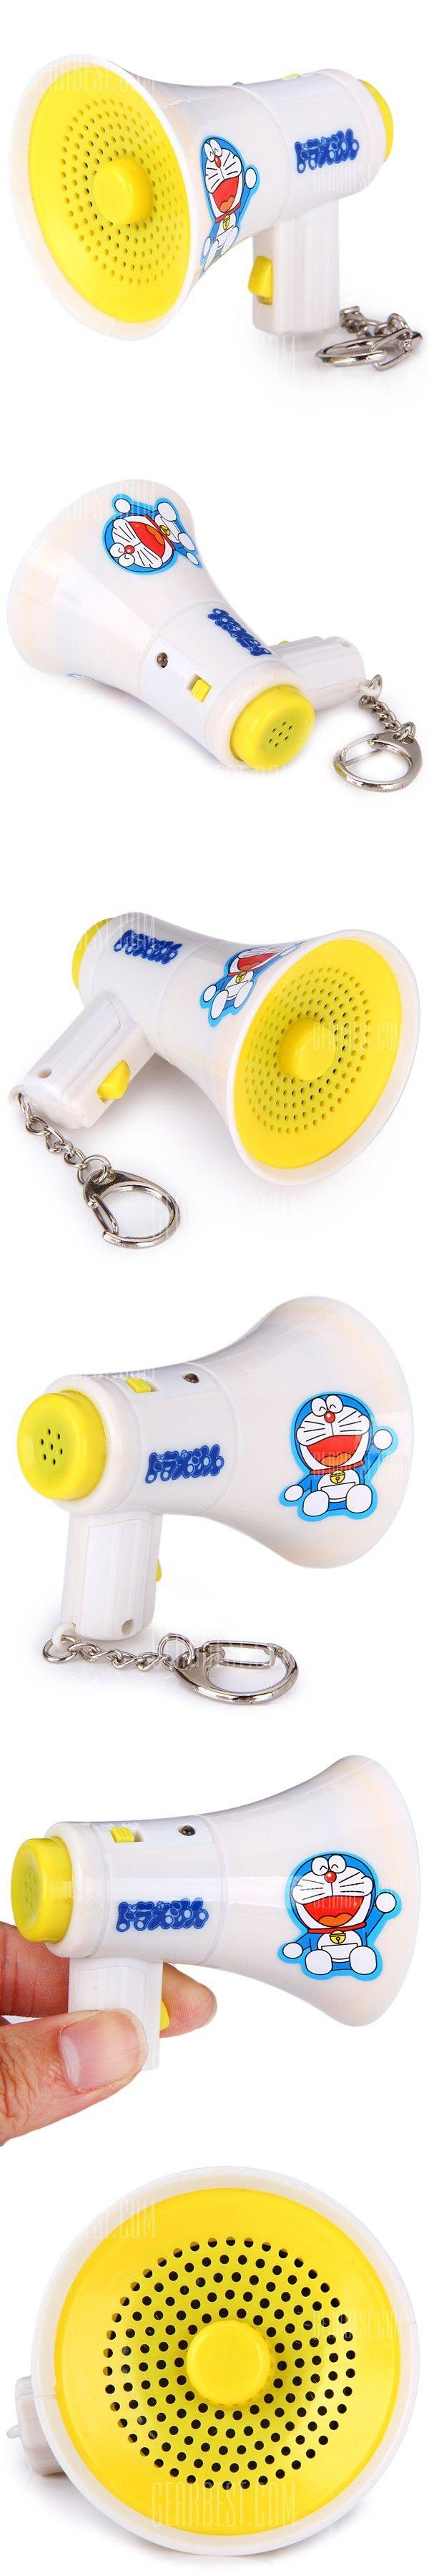 Kids Cute Mini Megaphone Doraemon Design Toy - FREE SHIPPING - Price: $5.28 - Buy Now: https://ariani-shop.com/s/153697